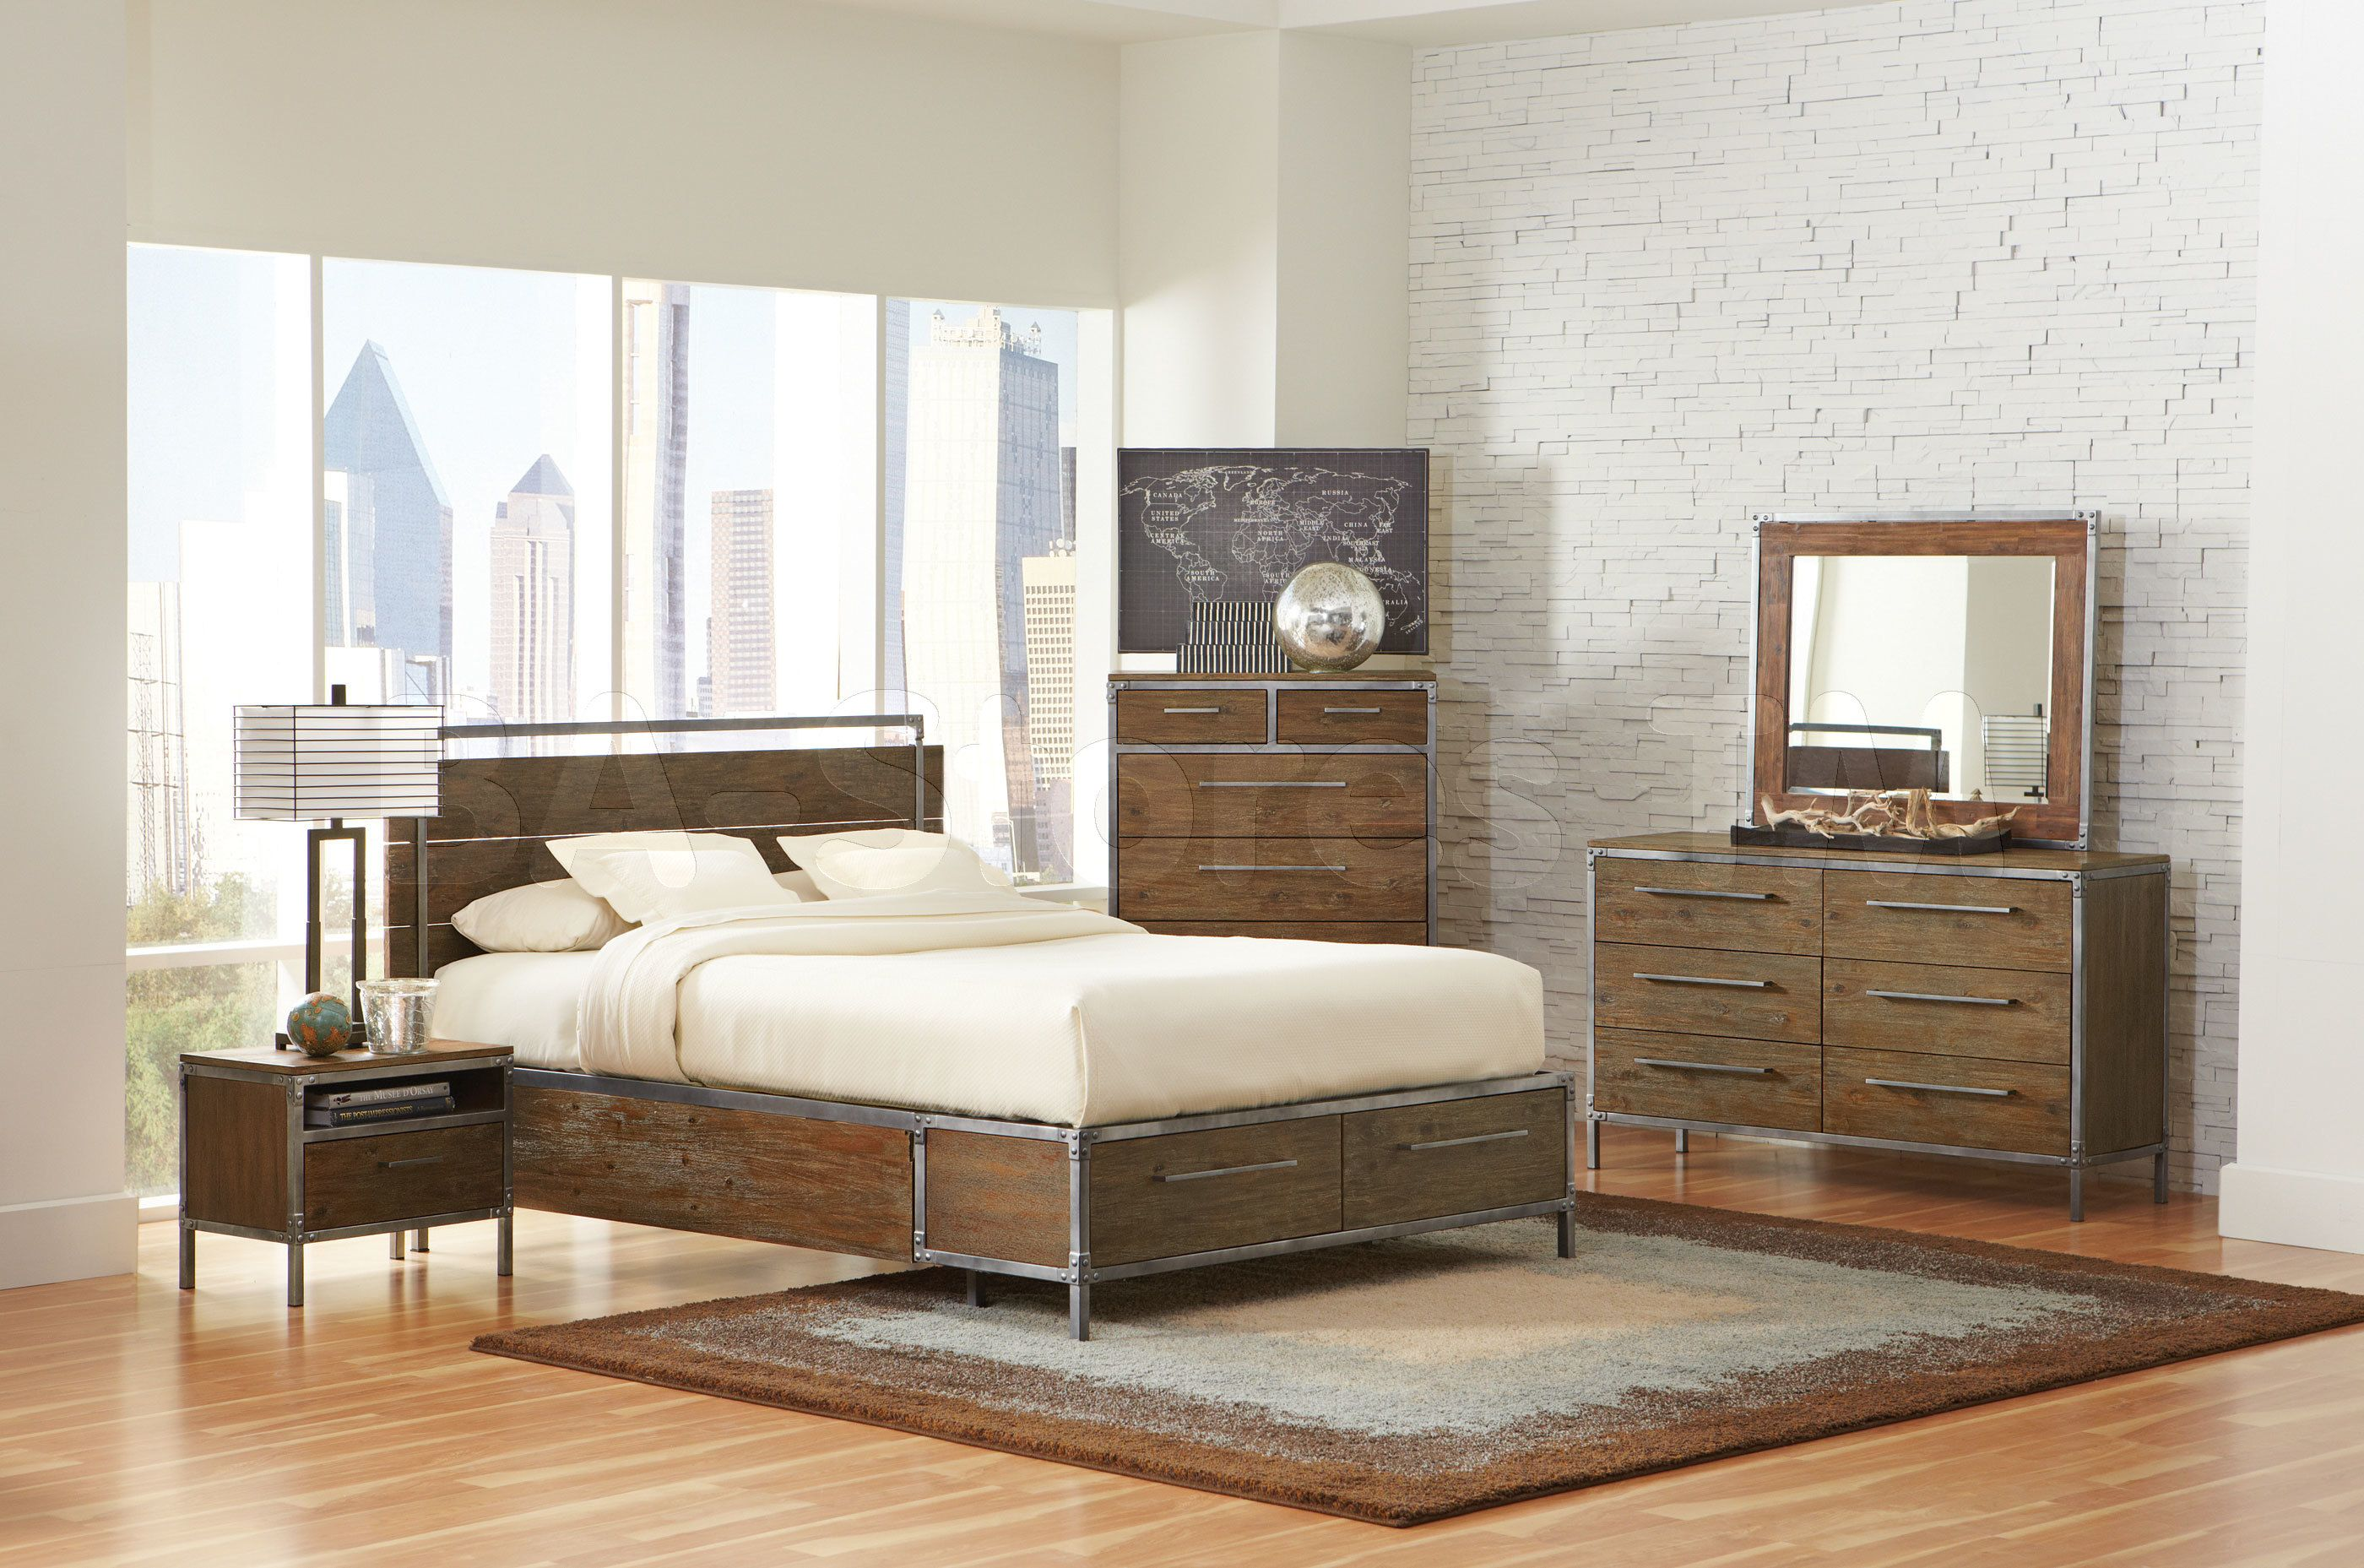 industrial bedroom furniture industrial bedroom furniture